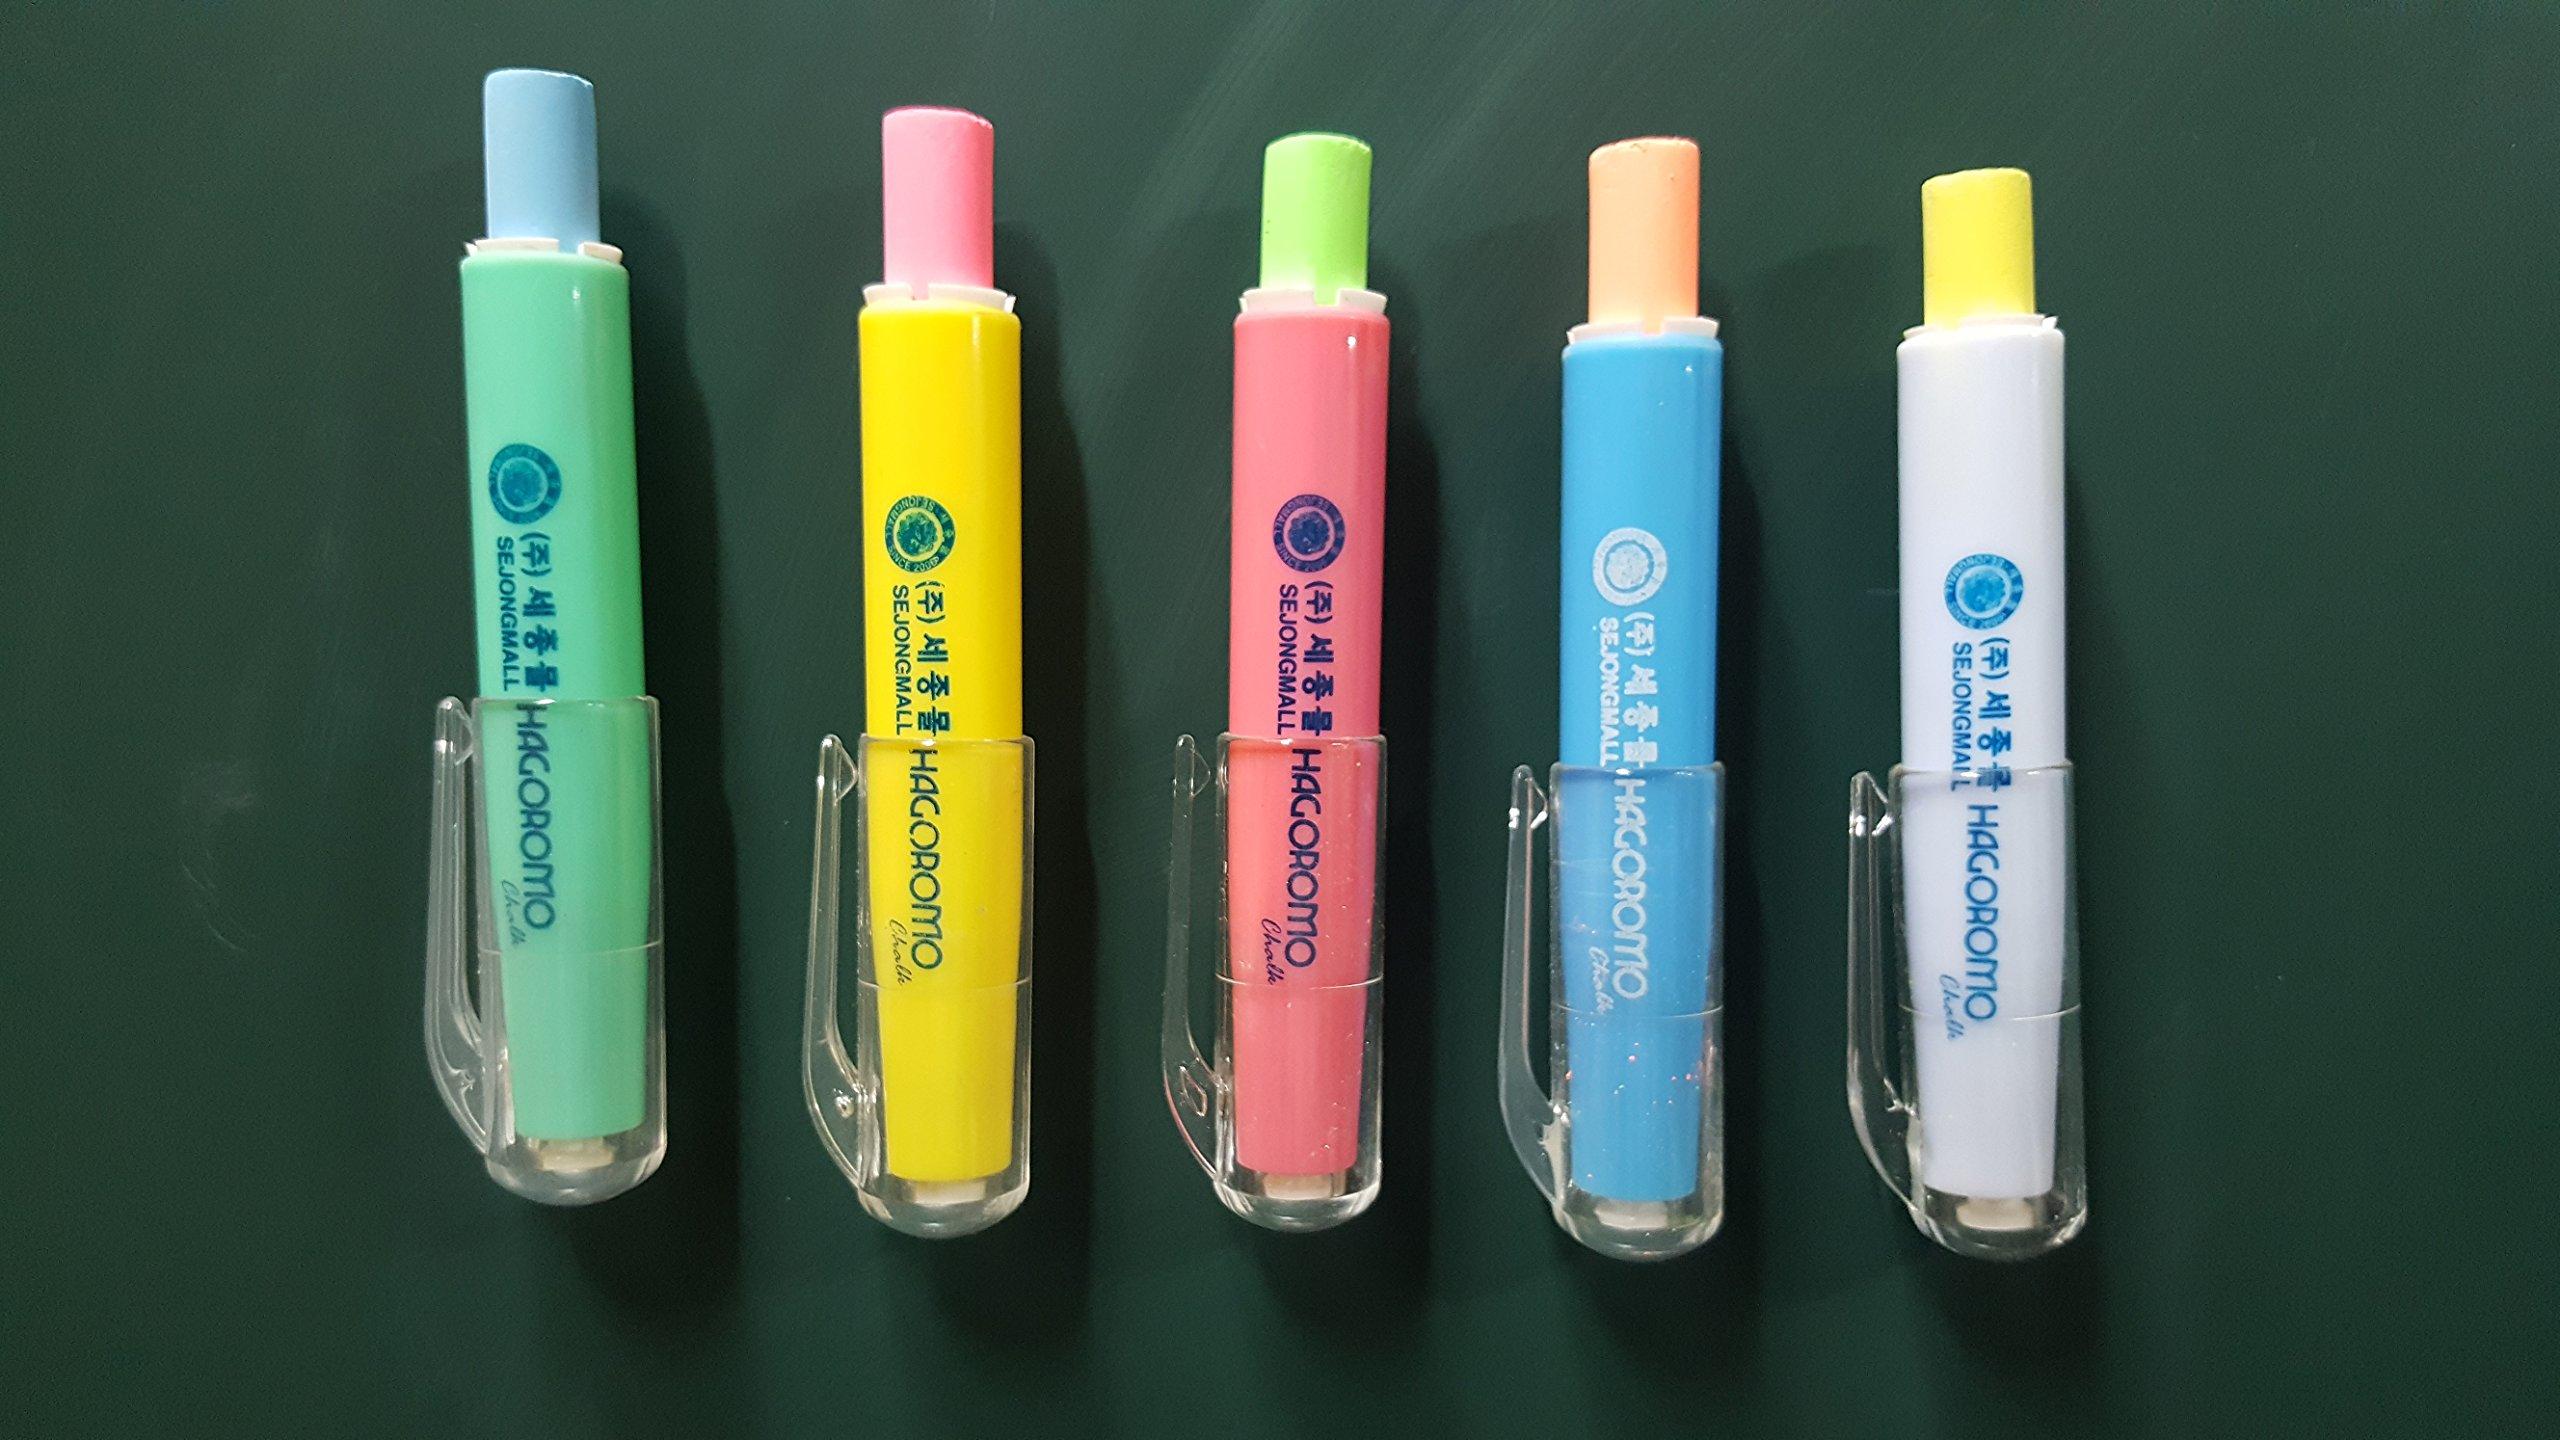 Hagoromo Wood Holder Case with 5 Colors Chalk Holder